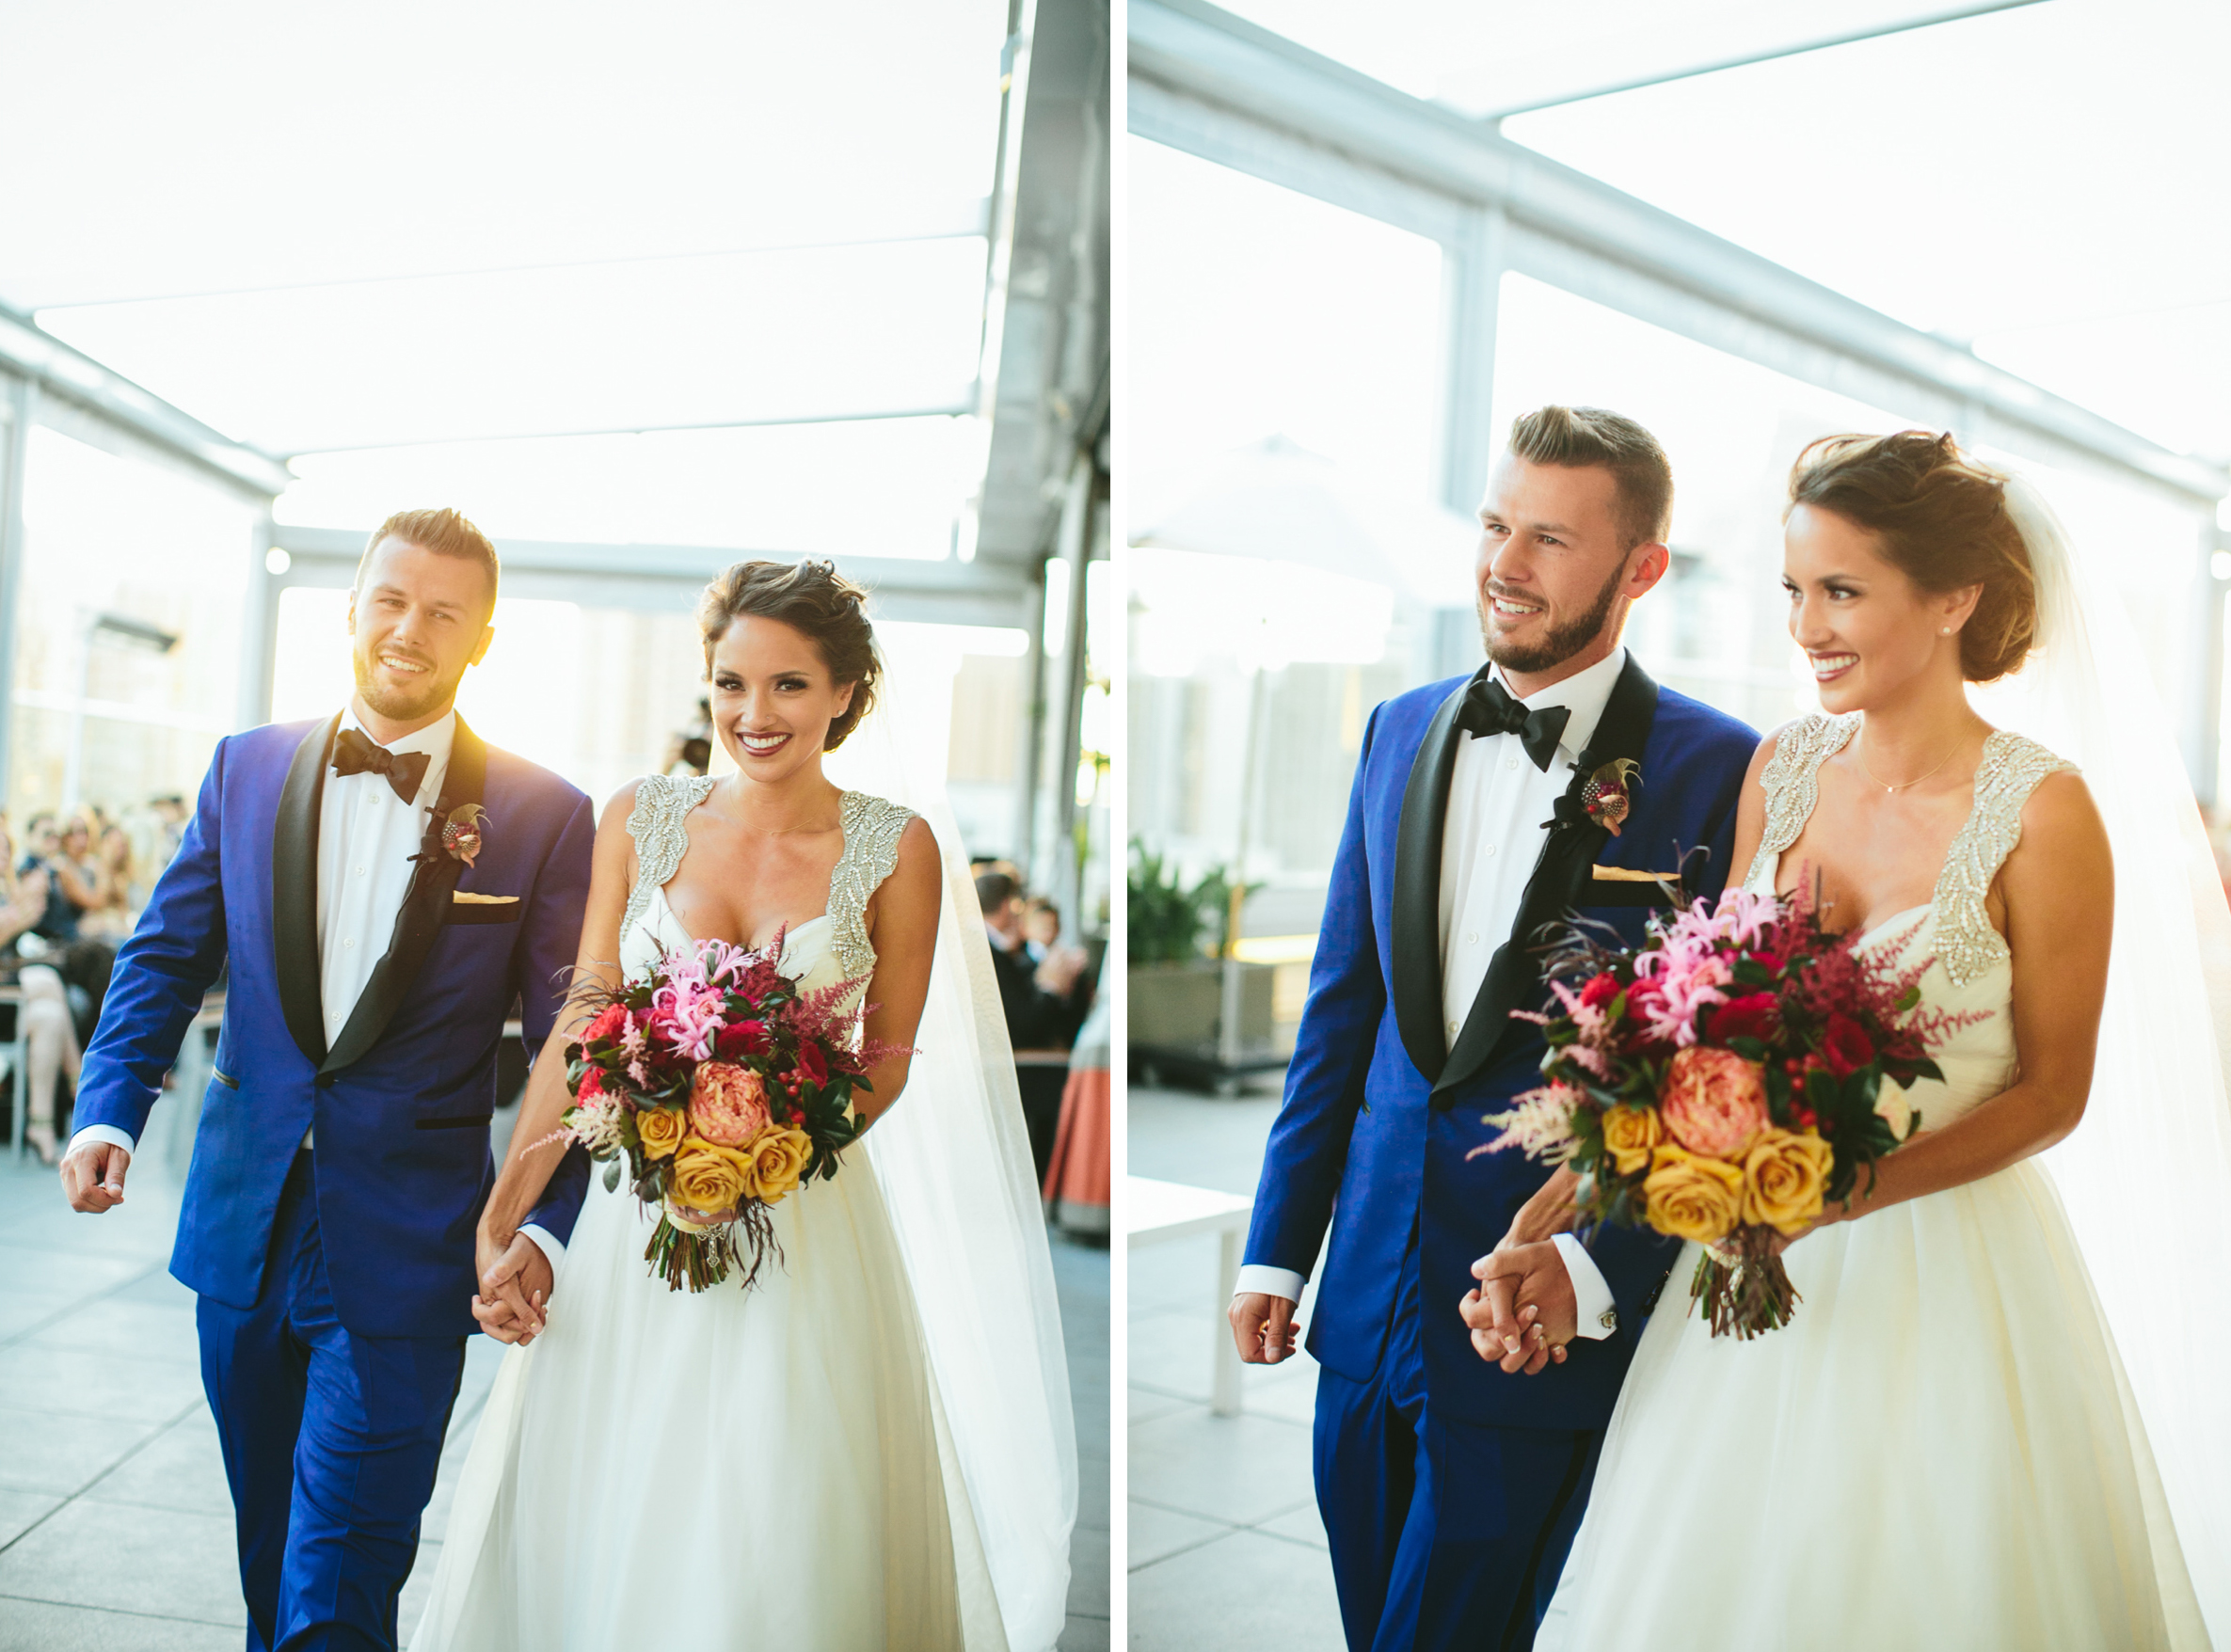 BRIANNA_JEFF_WEDDING_BLOG_LAYOUT Page 12